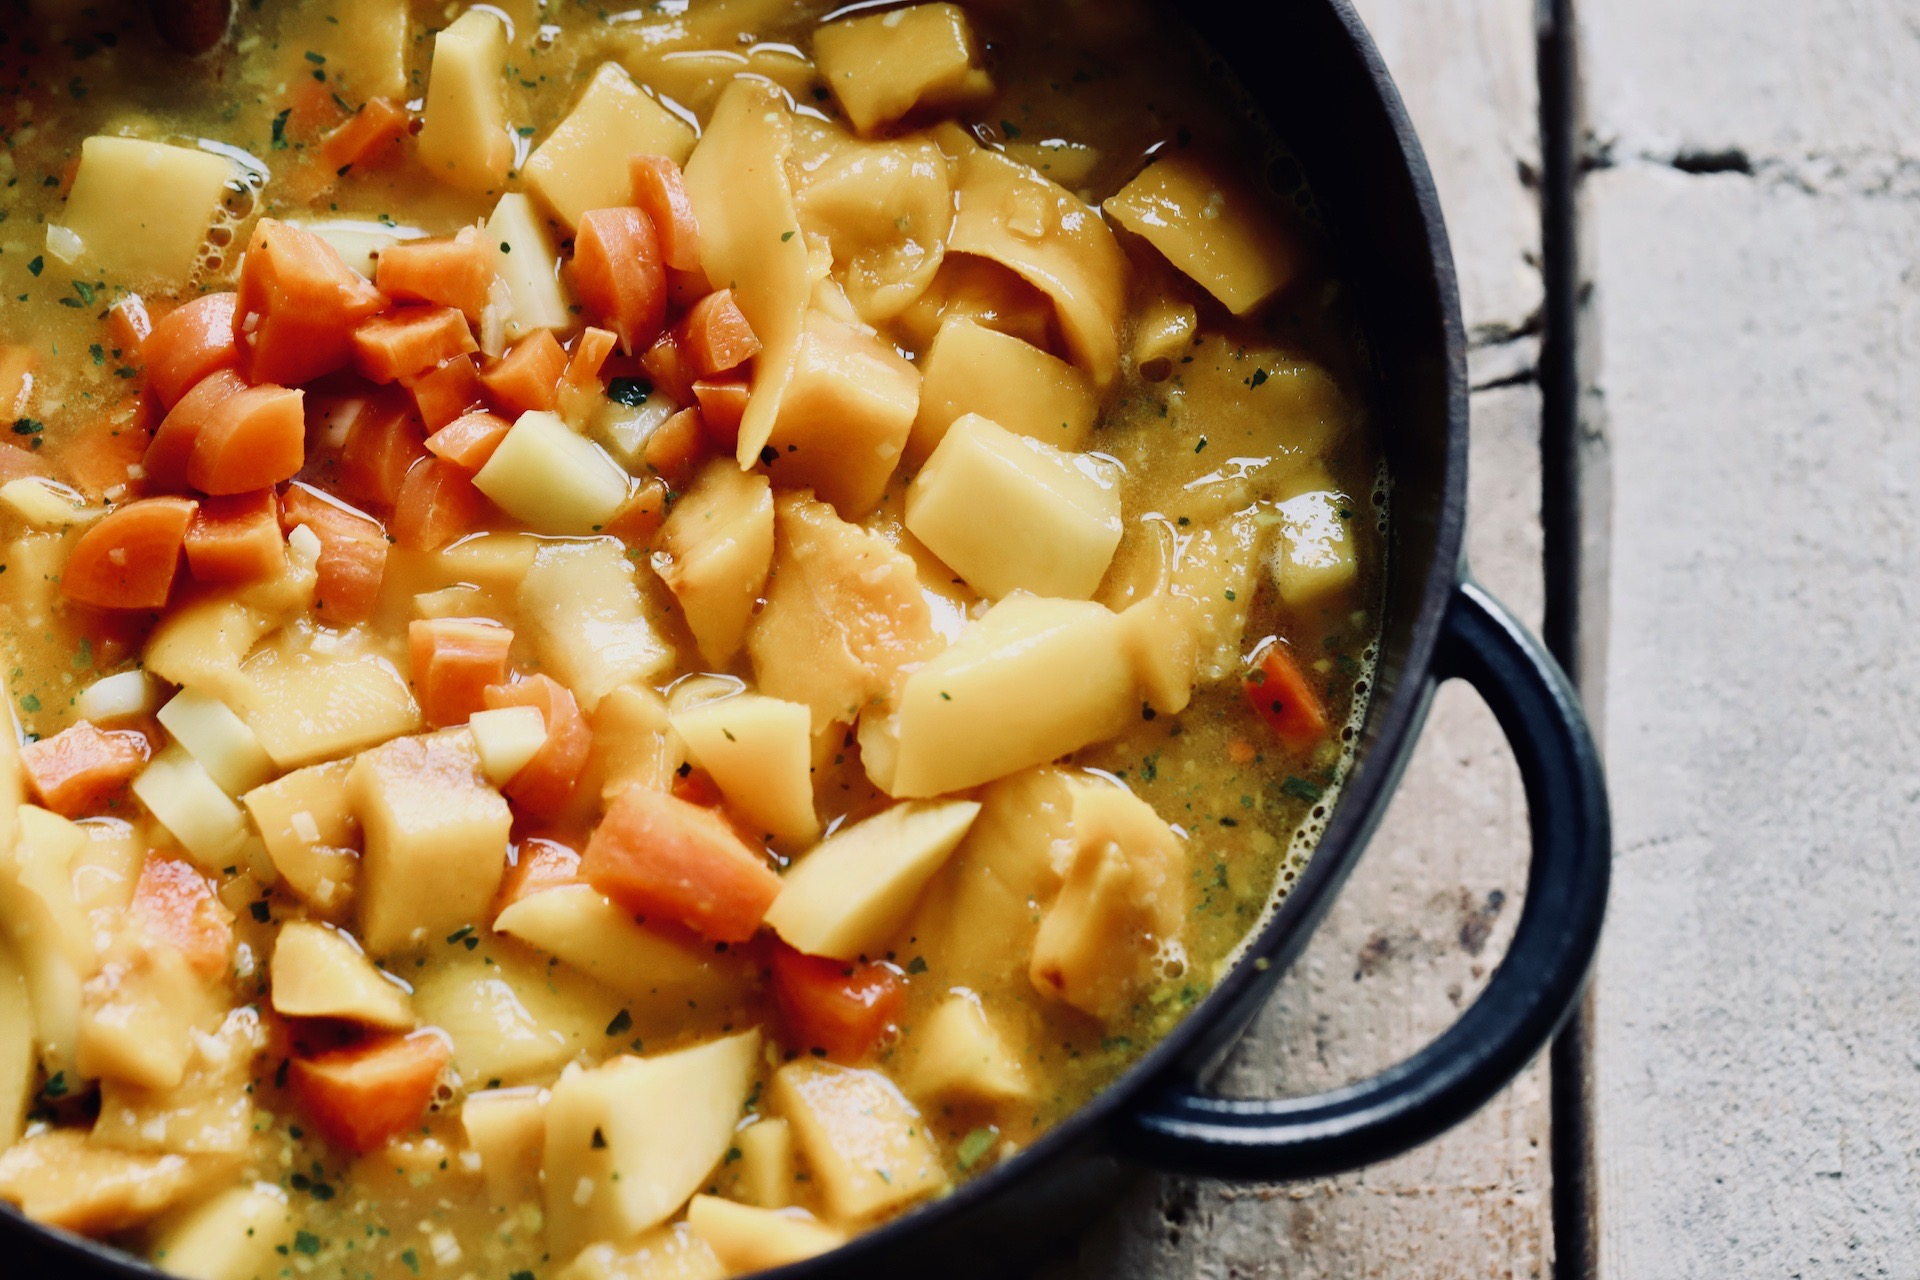 Mango-Karotten Suppe mit Ingwer